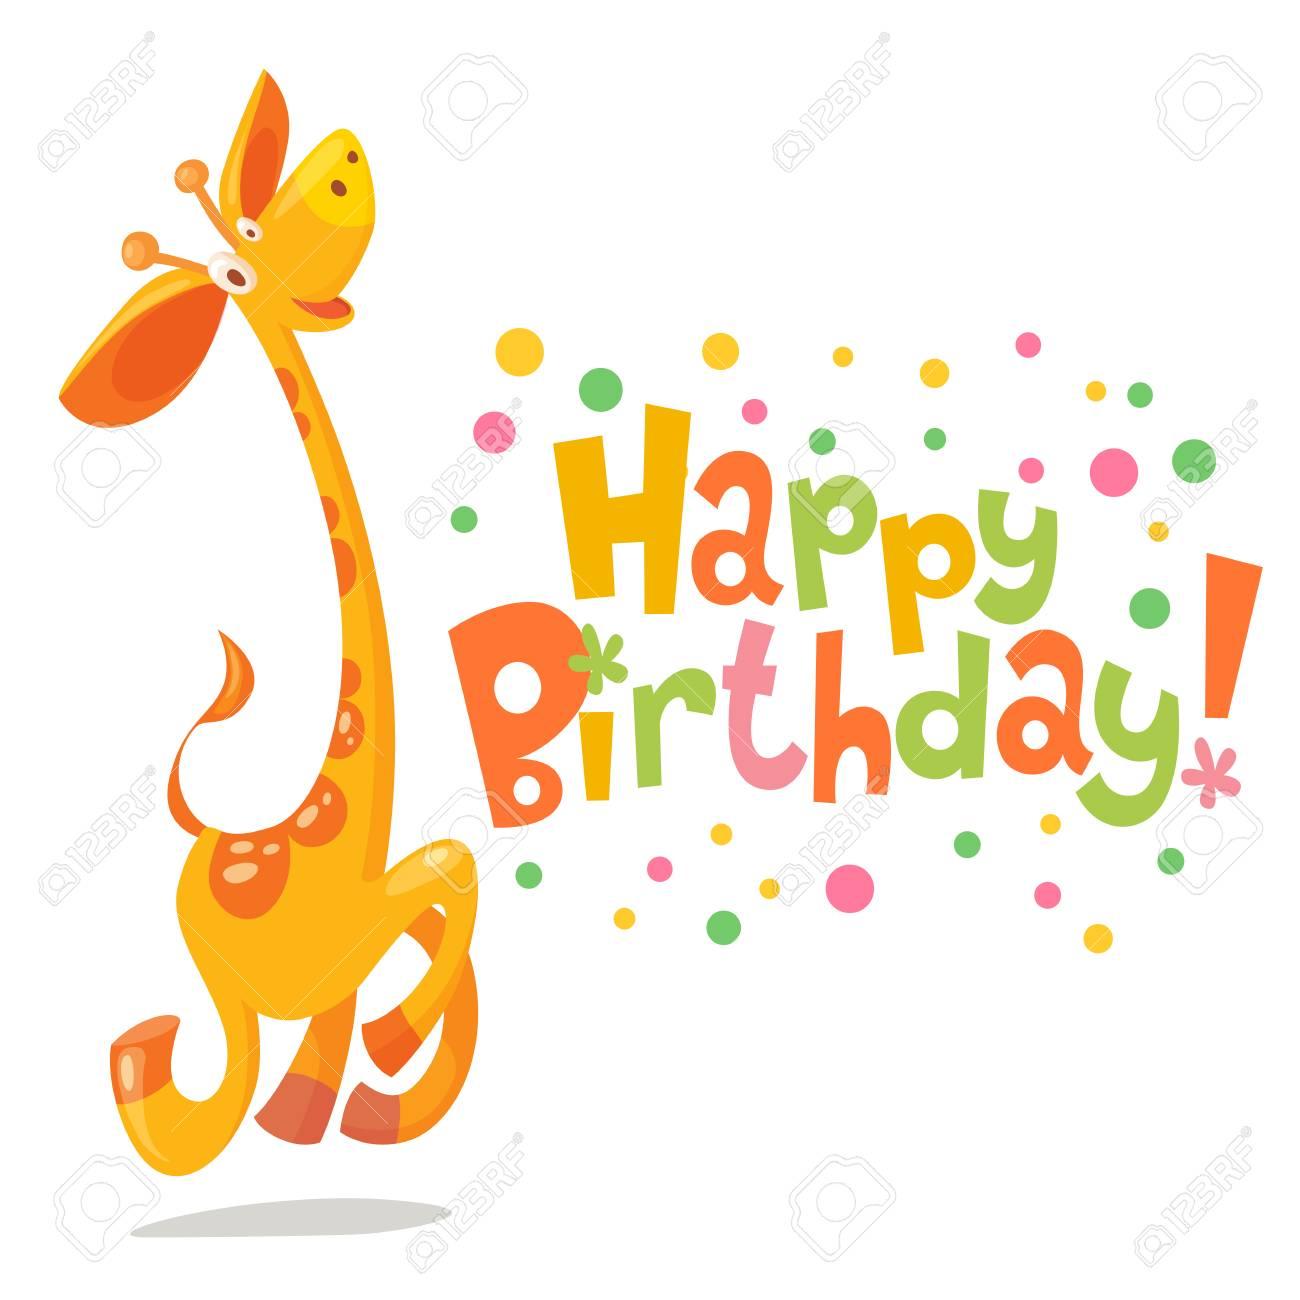 Happy Birthday Vector Card Baby Birthday Card With Cute Giraffe